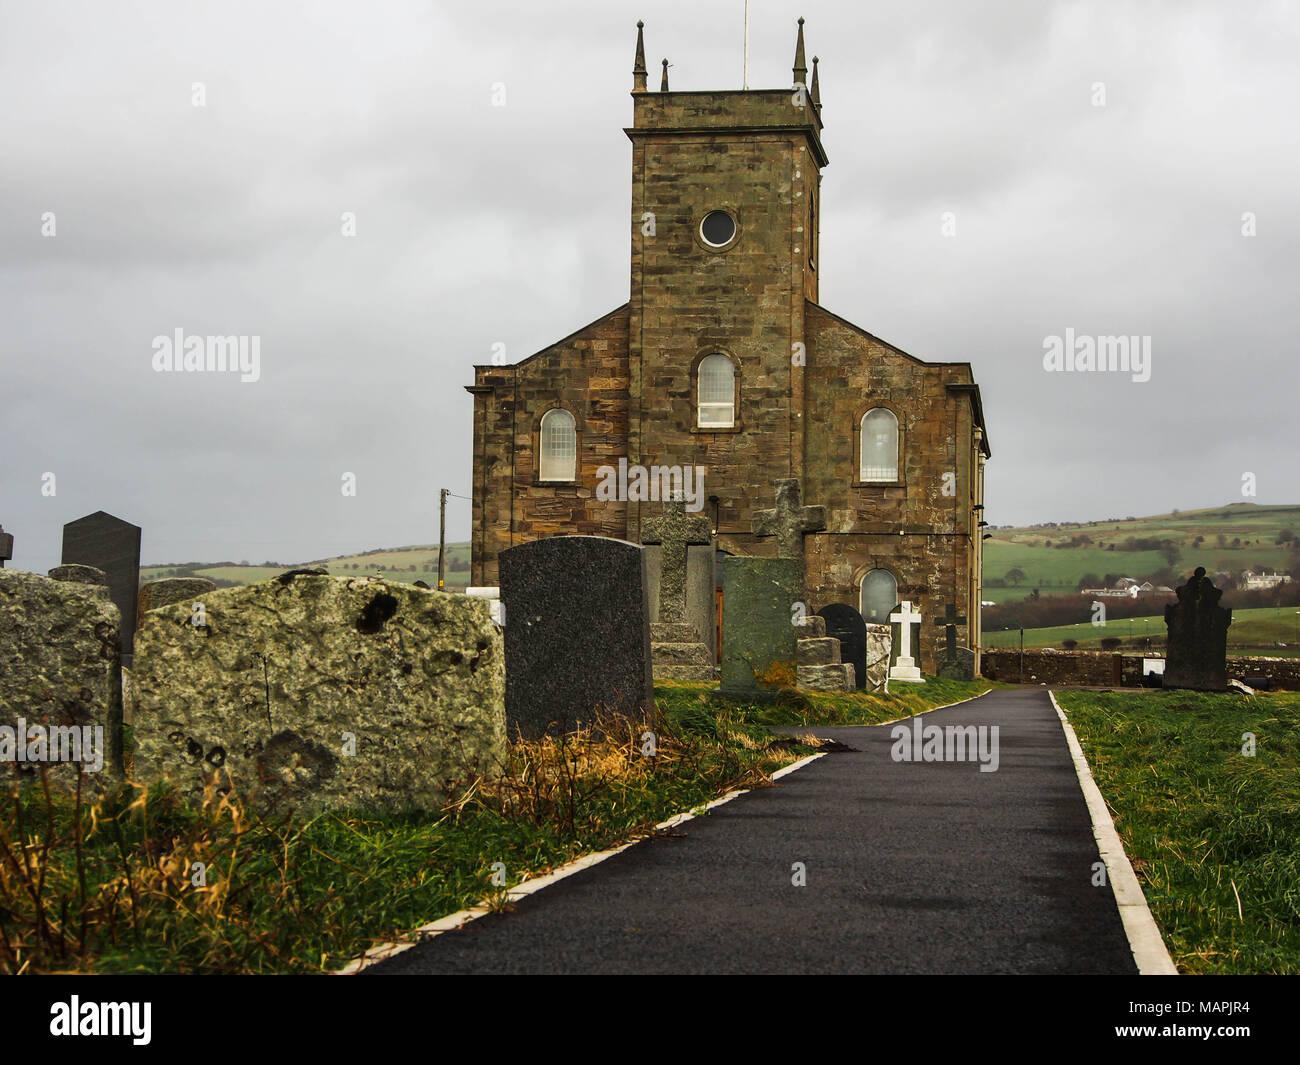 St Bridget's Church Moresby, Whitehaven, Cumbria, England - Stock Image